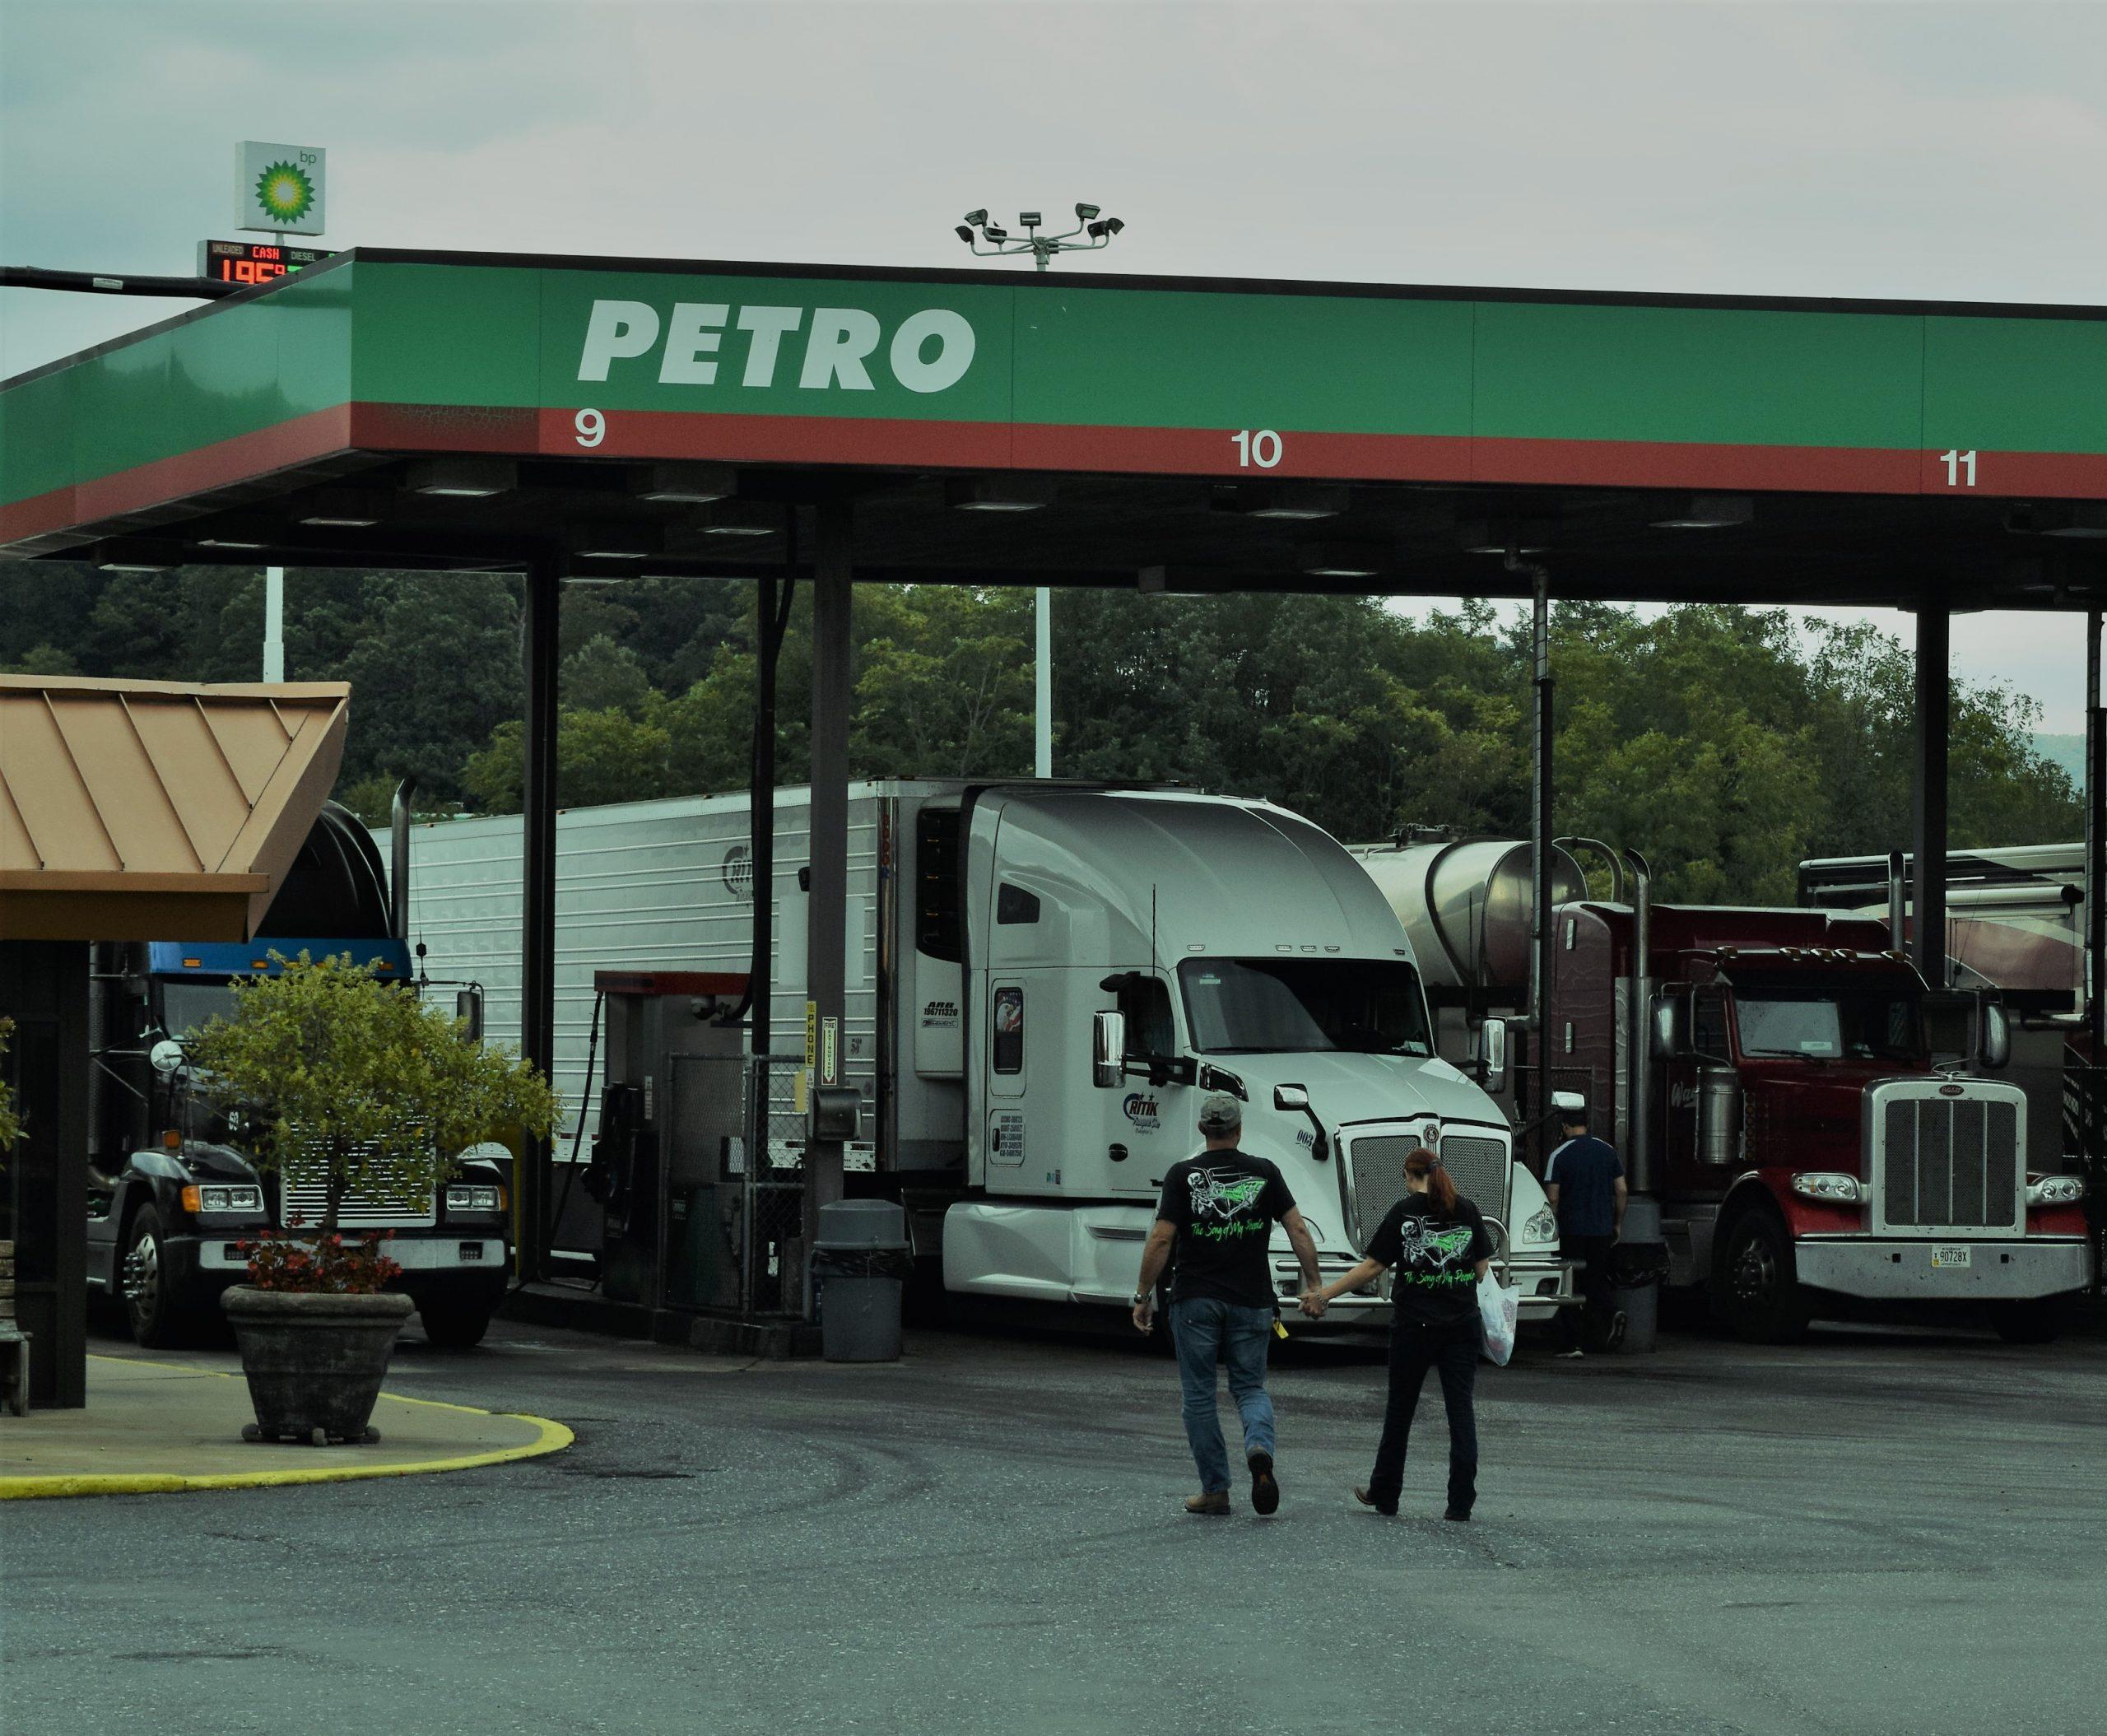 Couple holding hands walking towards Petro fuel pumps